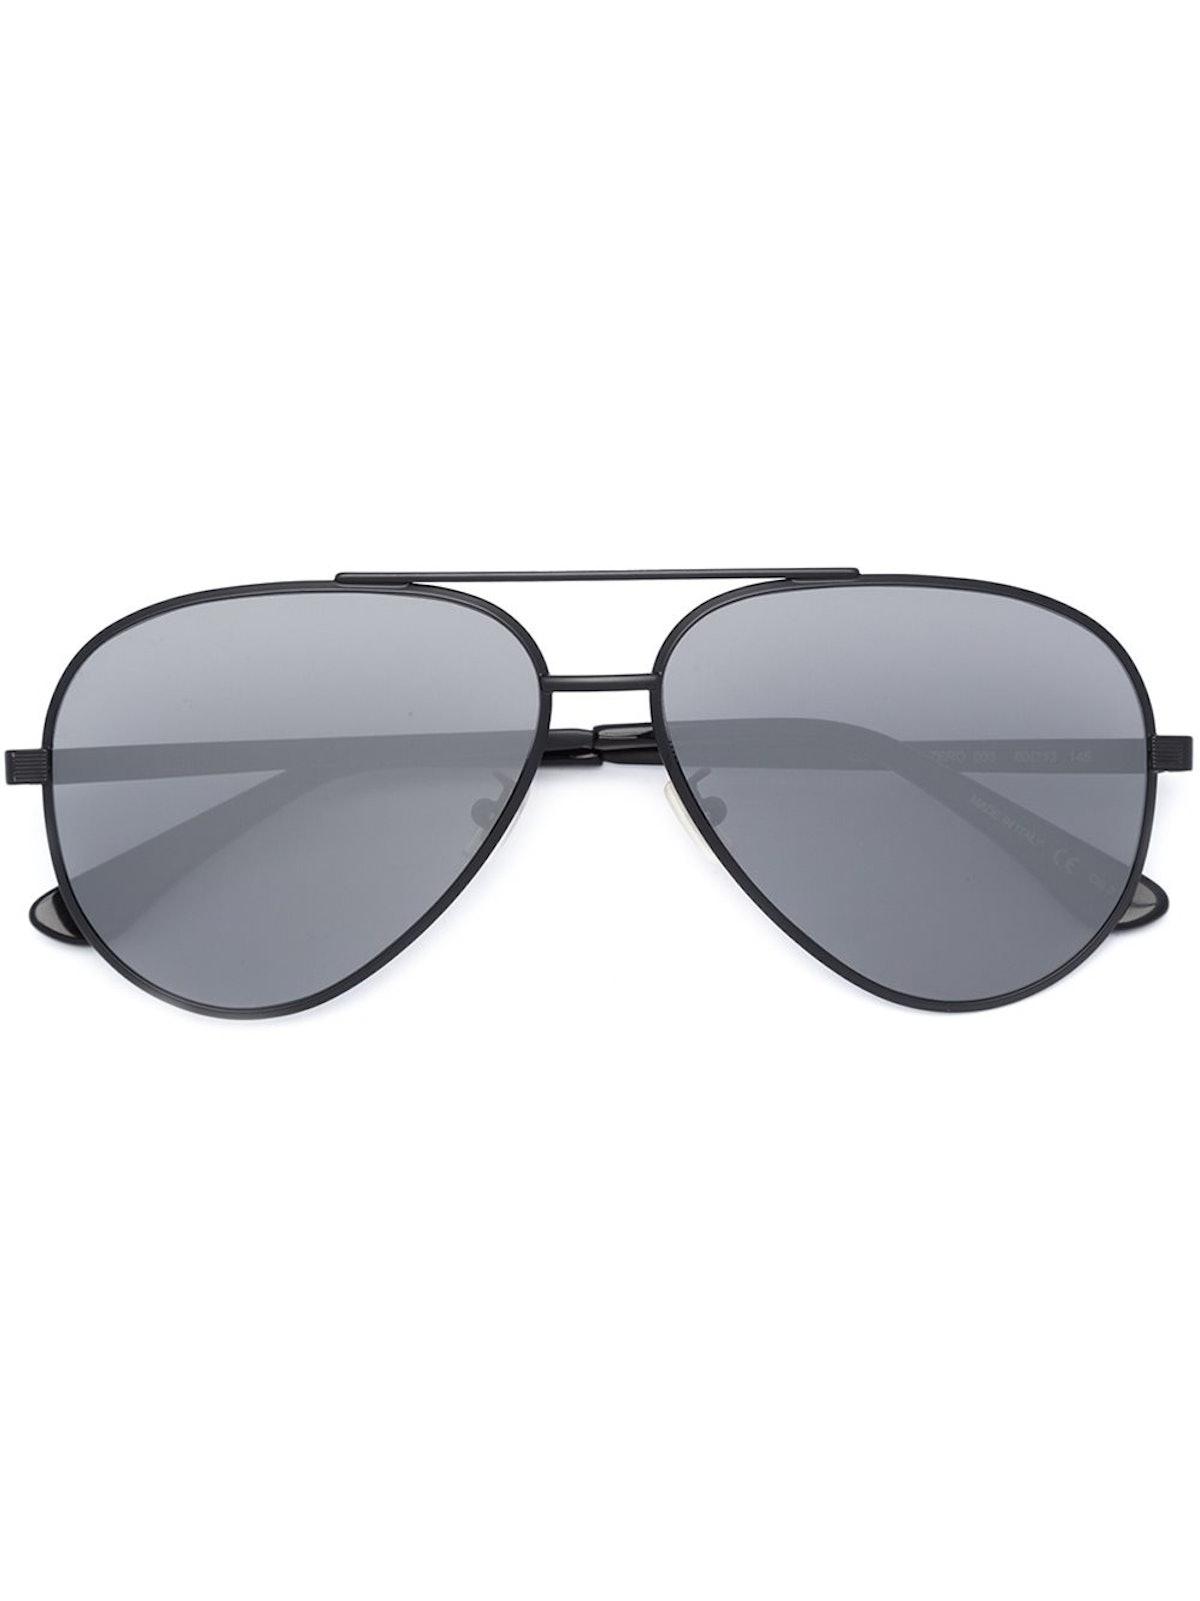 KirnaZabete-Saint-Laurent-Aviator-Sunglasses-31.jpg